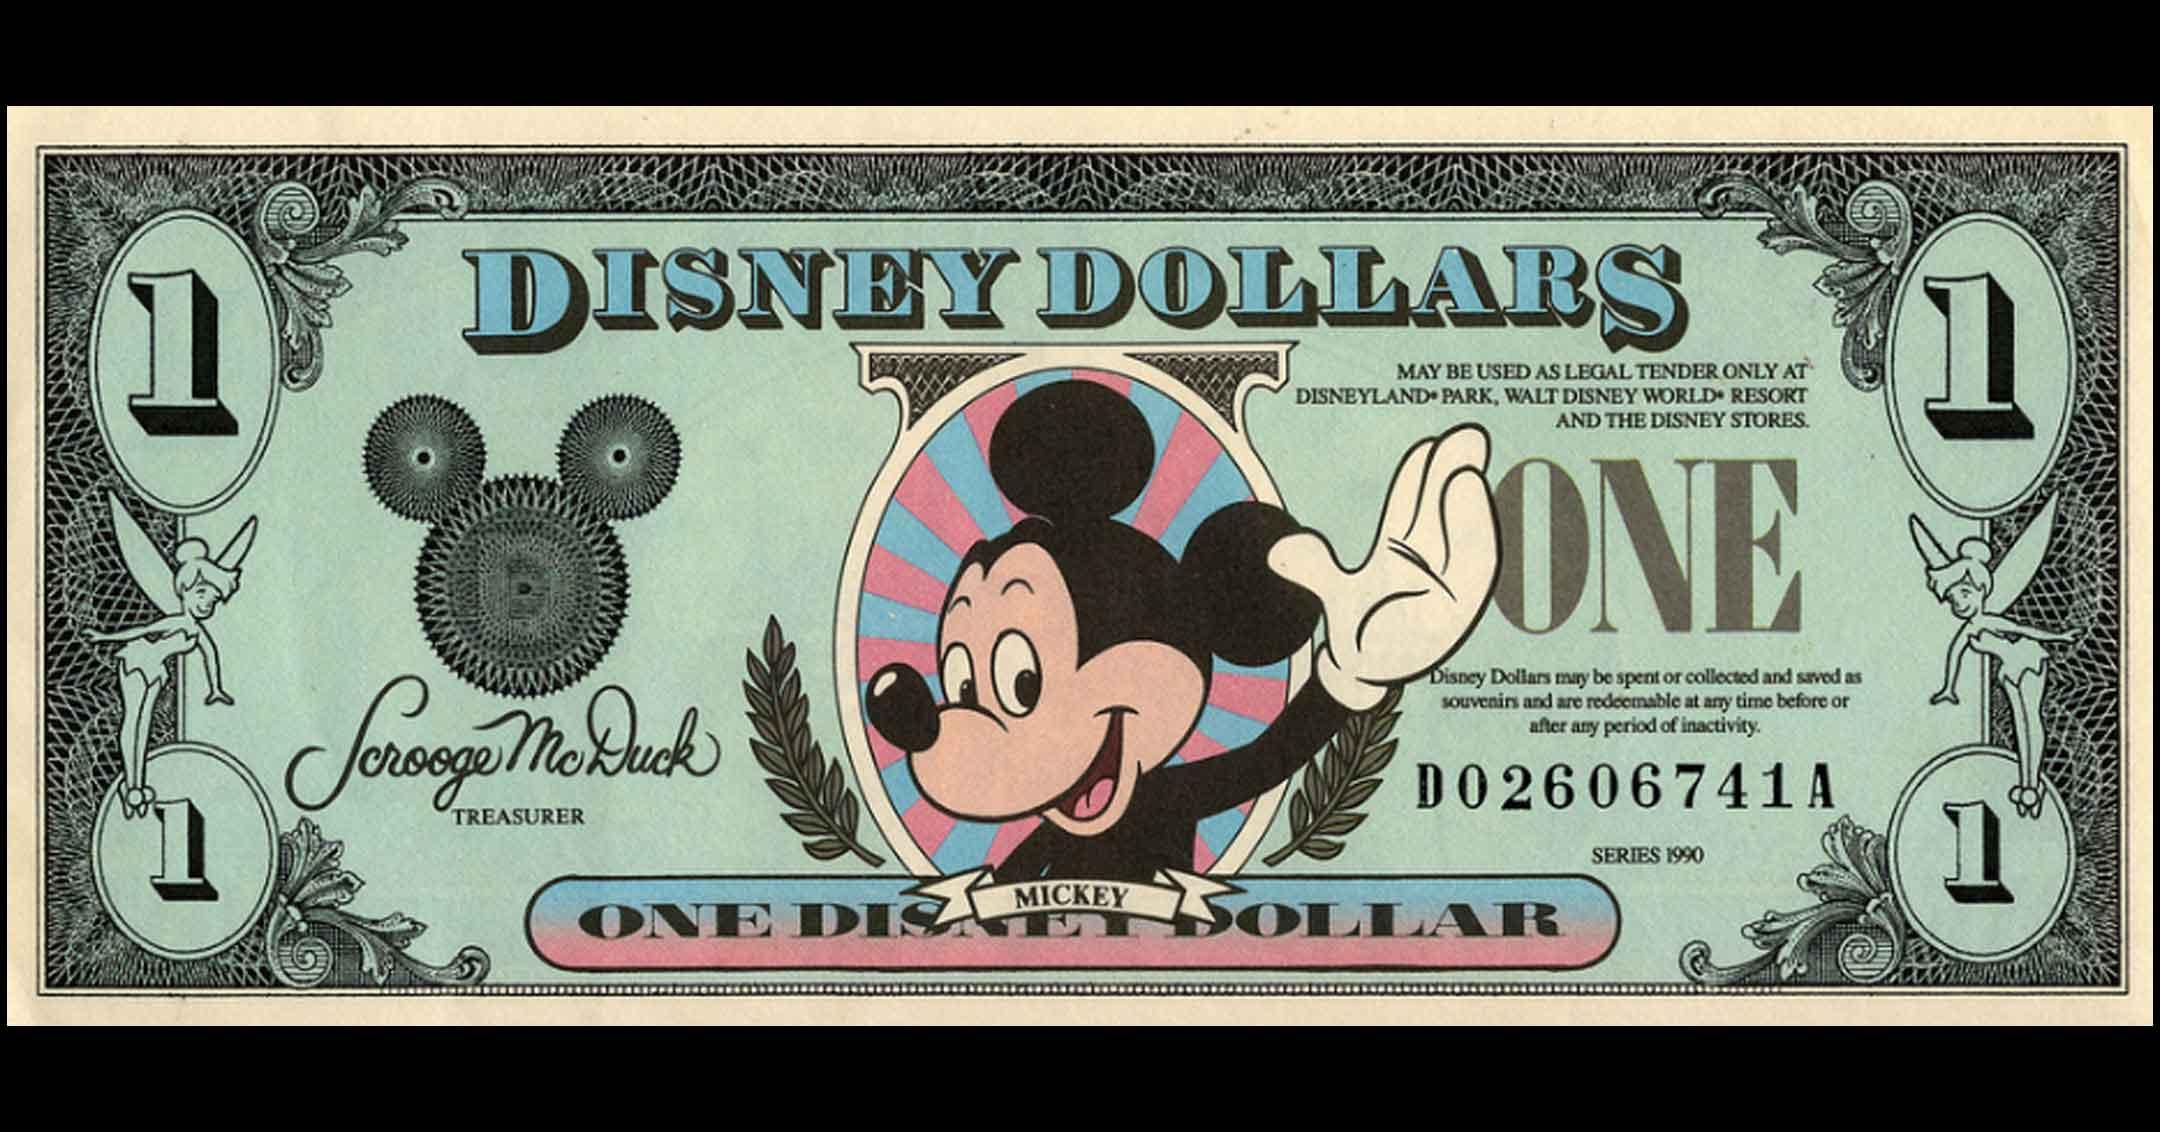 Disney Dollars   DaveTavres.com